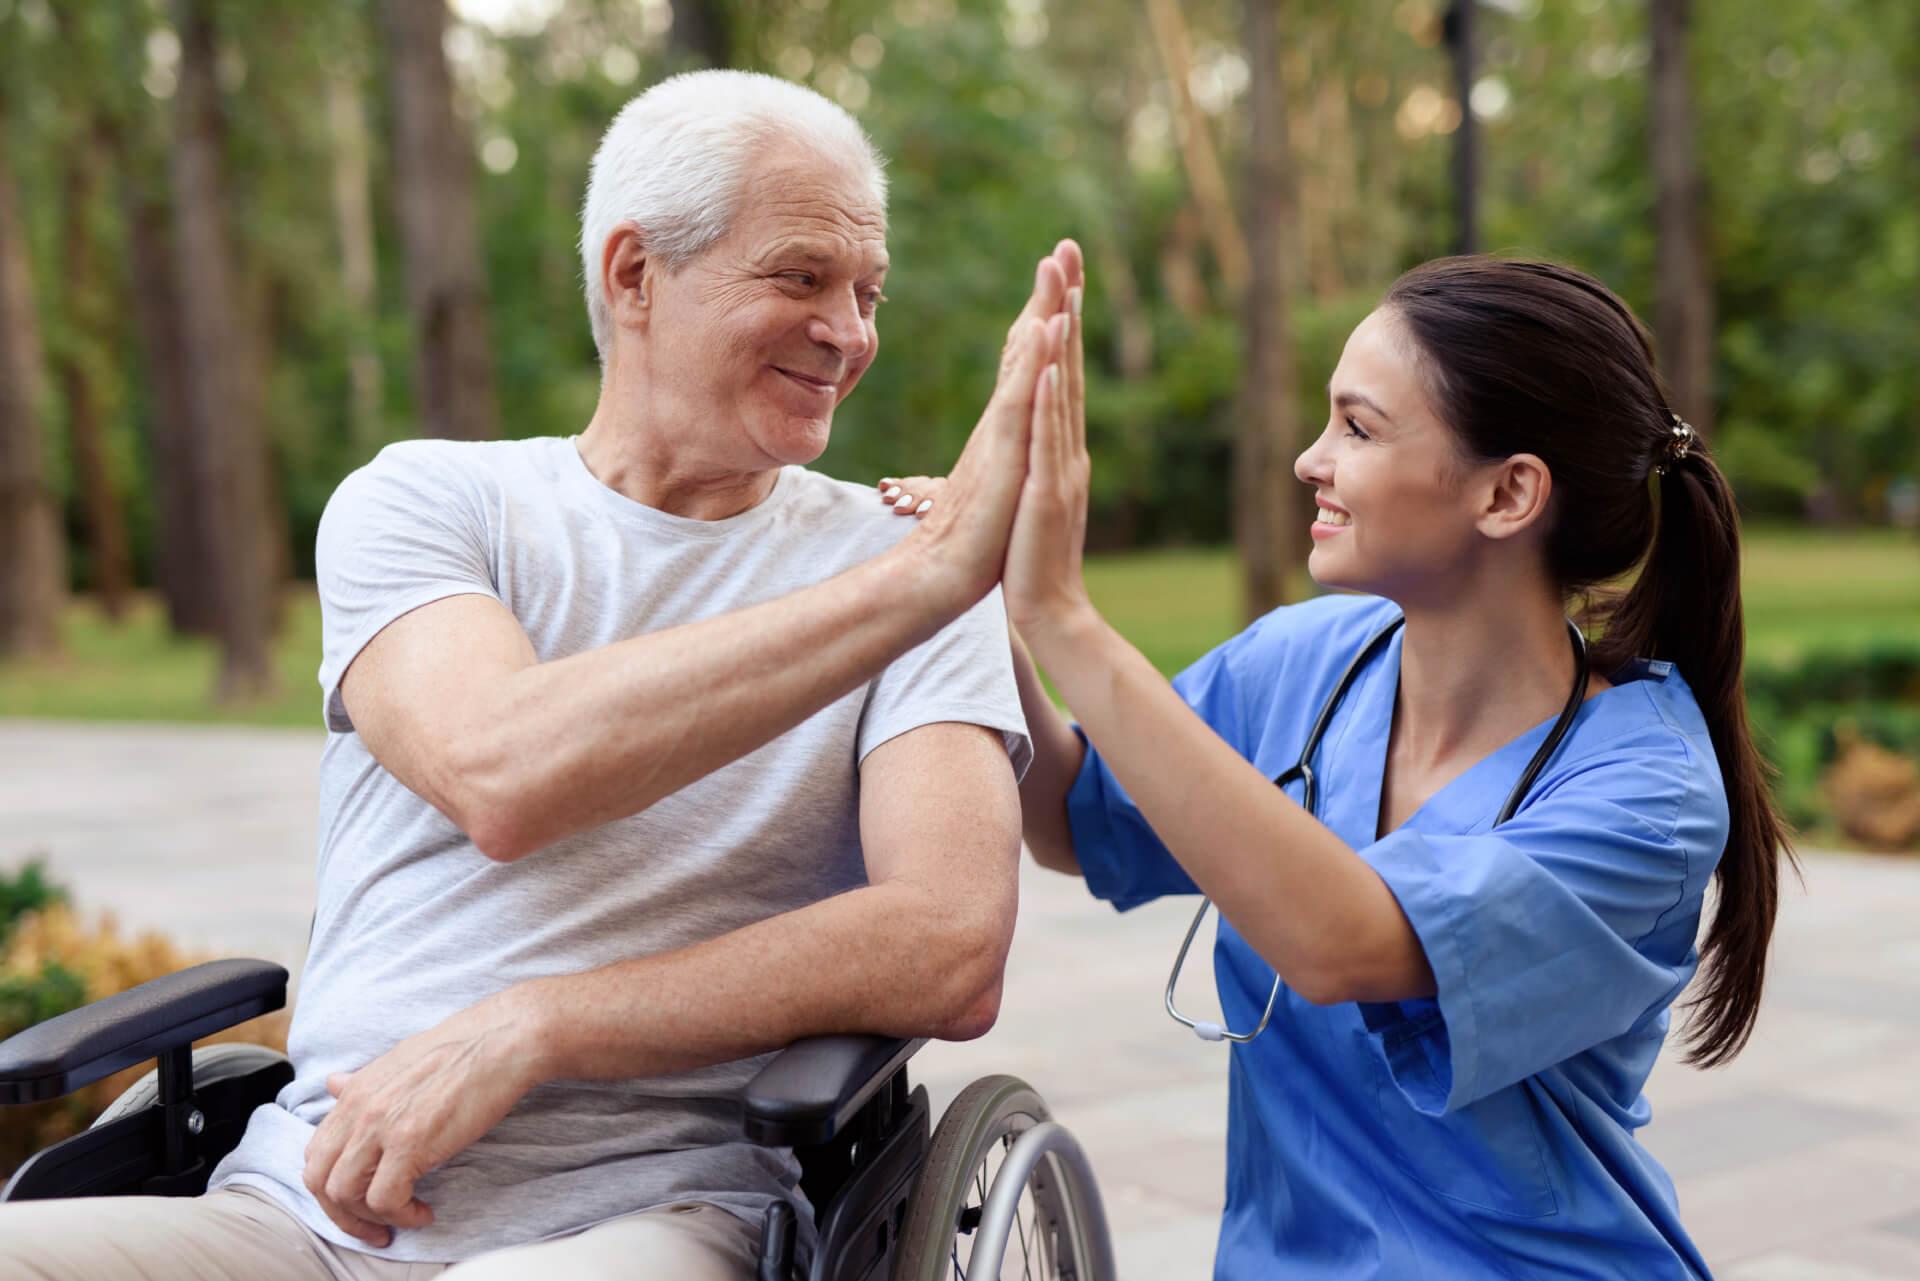 nurse-old-man-wheelchair-high-five (1) (1)